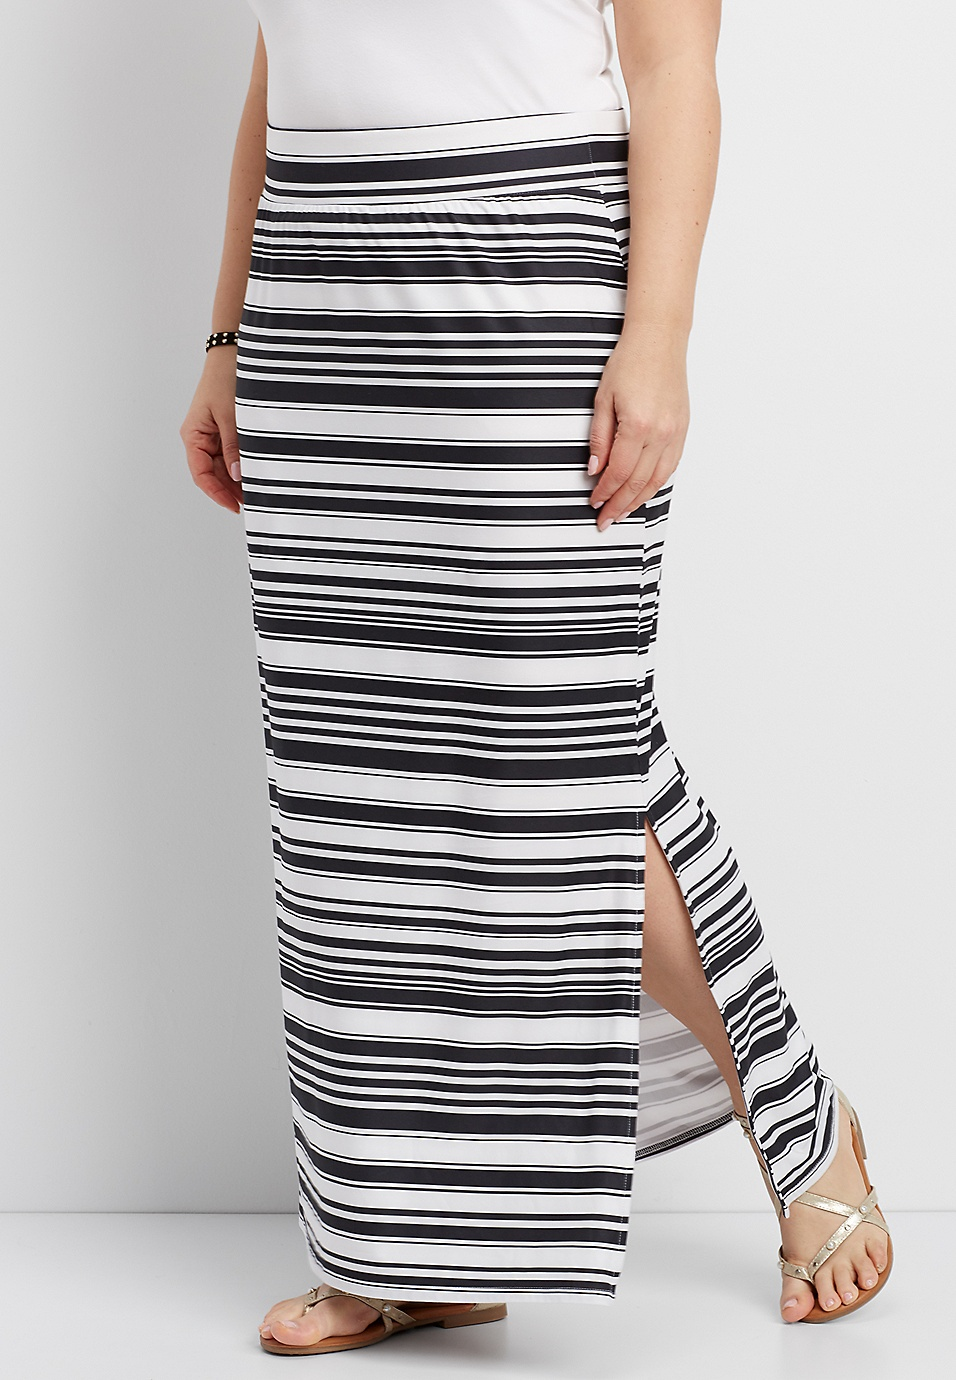 bcdb72034a Long Black And White Striped Maxi Skirt | Huston Fislar Photography